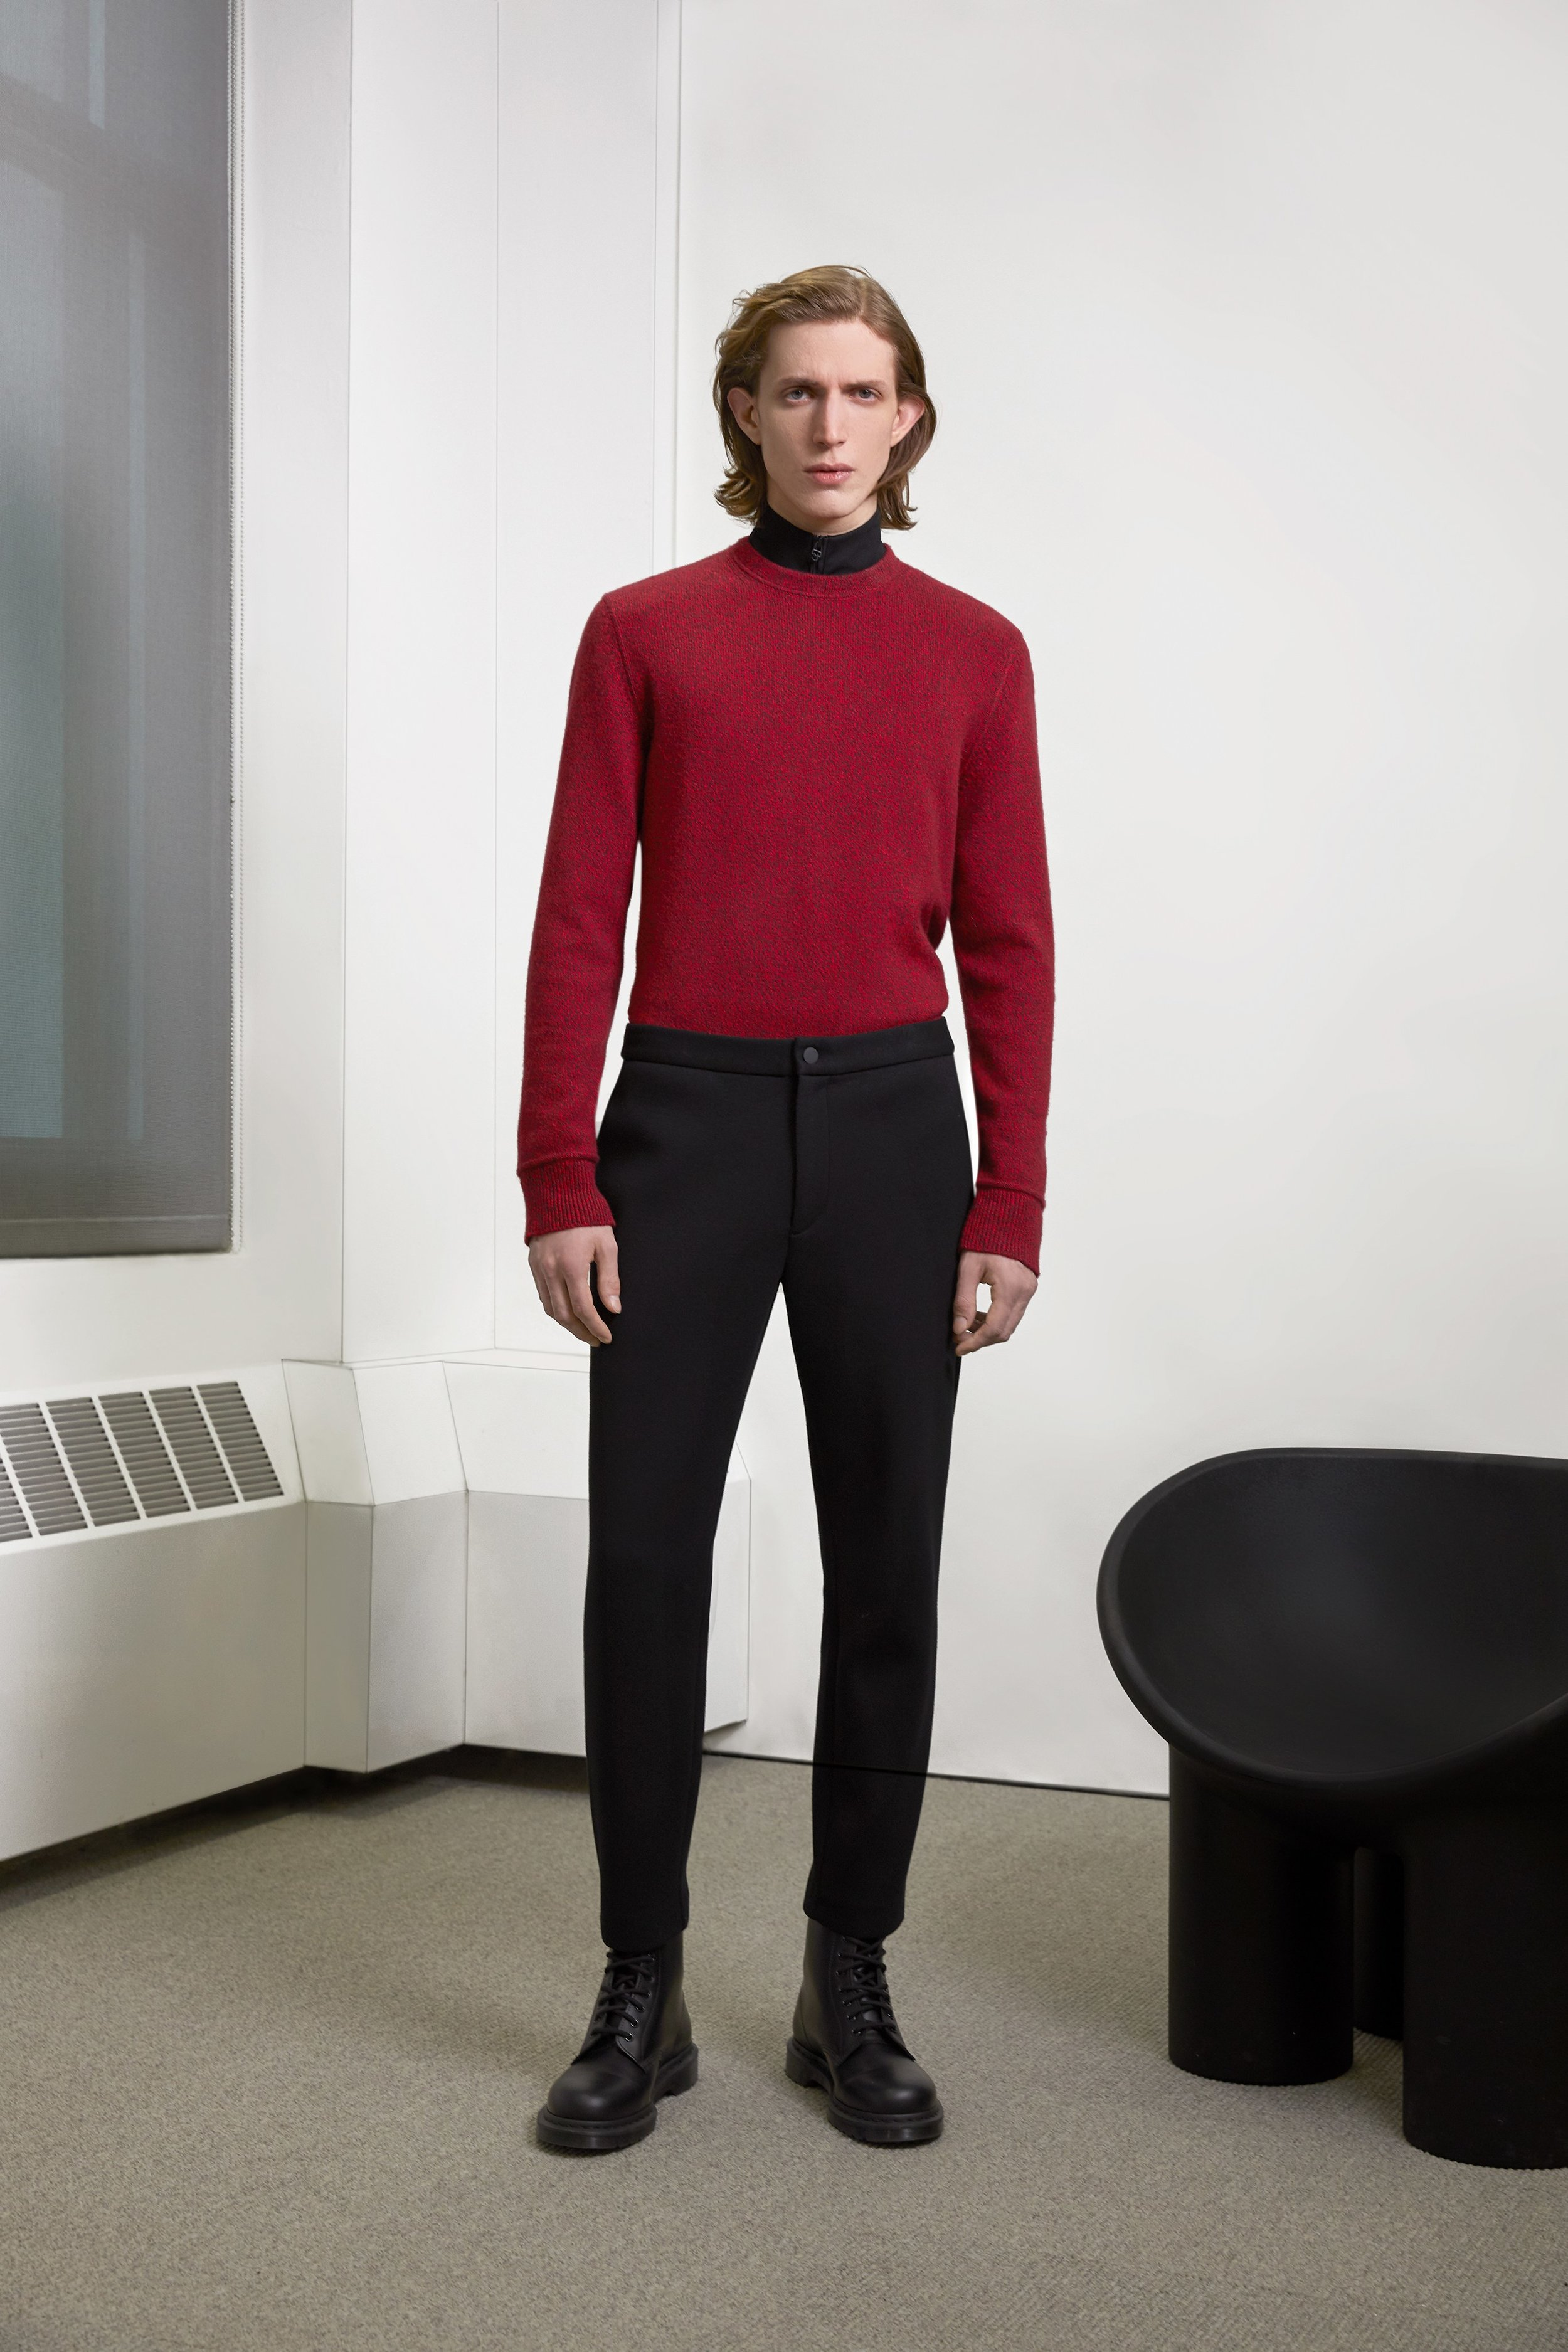 Theory Fall 2019 Menswear